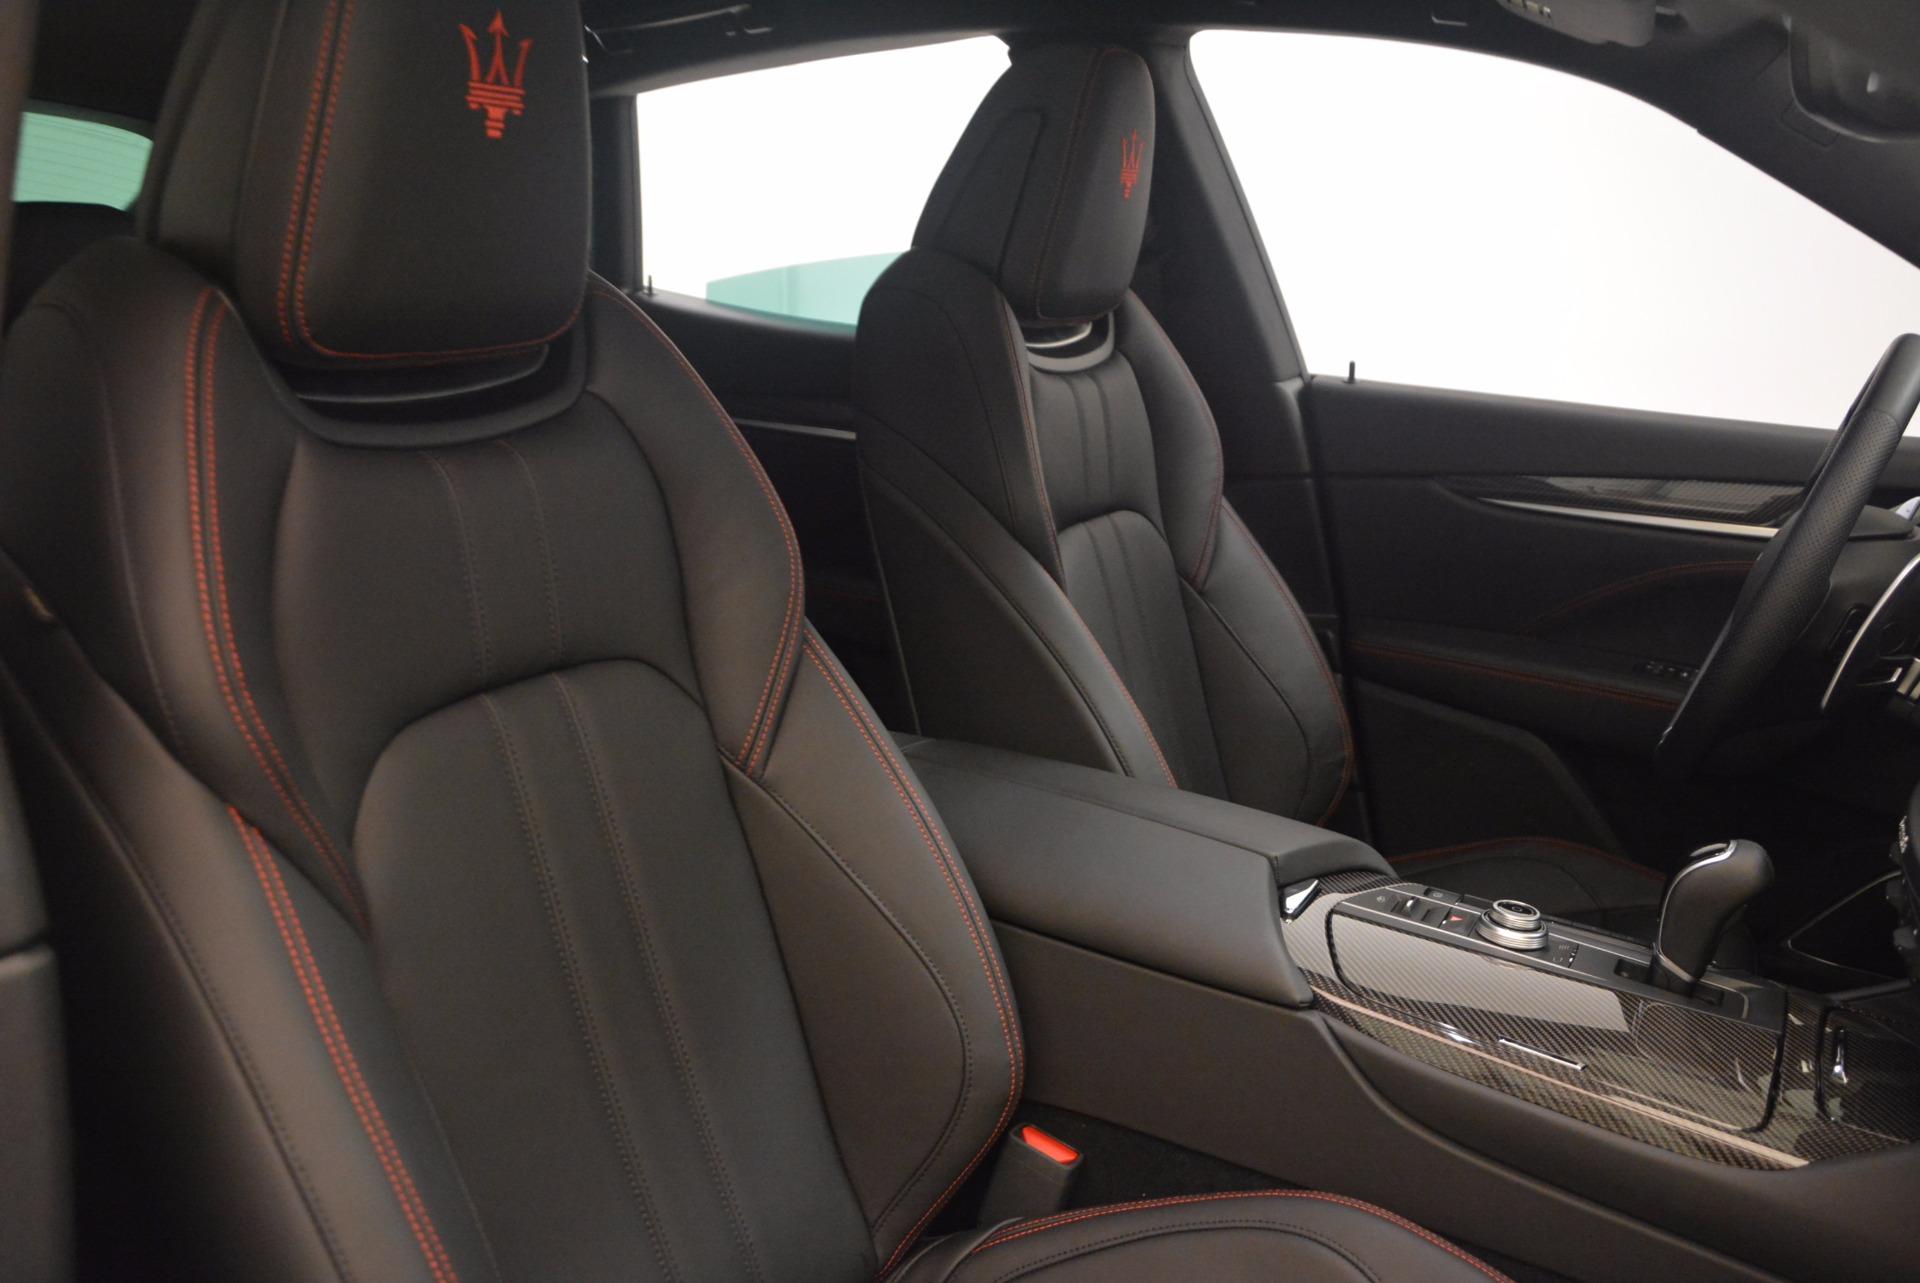 Used 2017 Maserati Levante S For Sale In Westport, CT 1112_p22